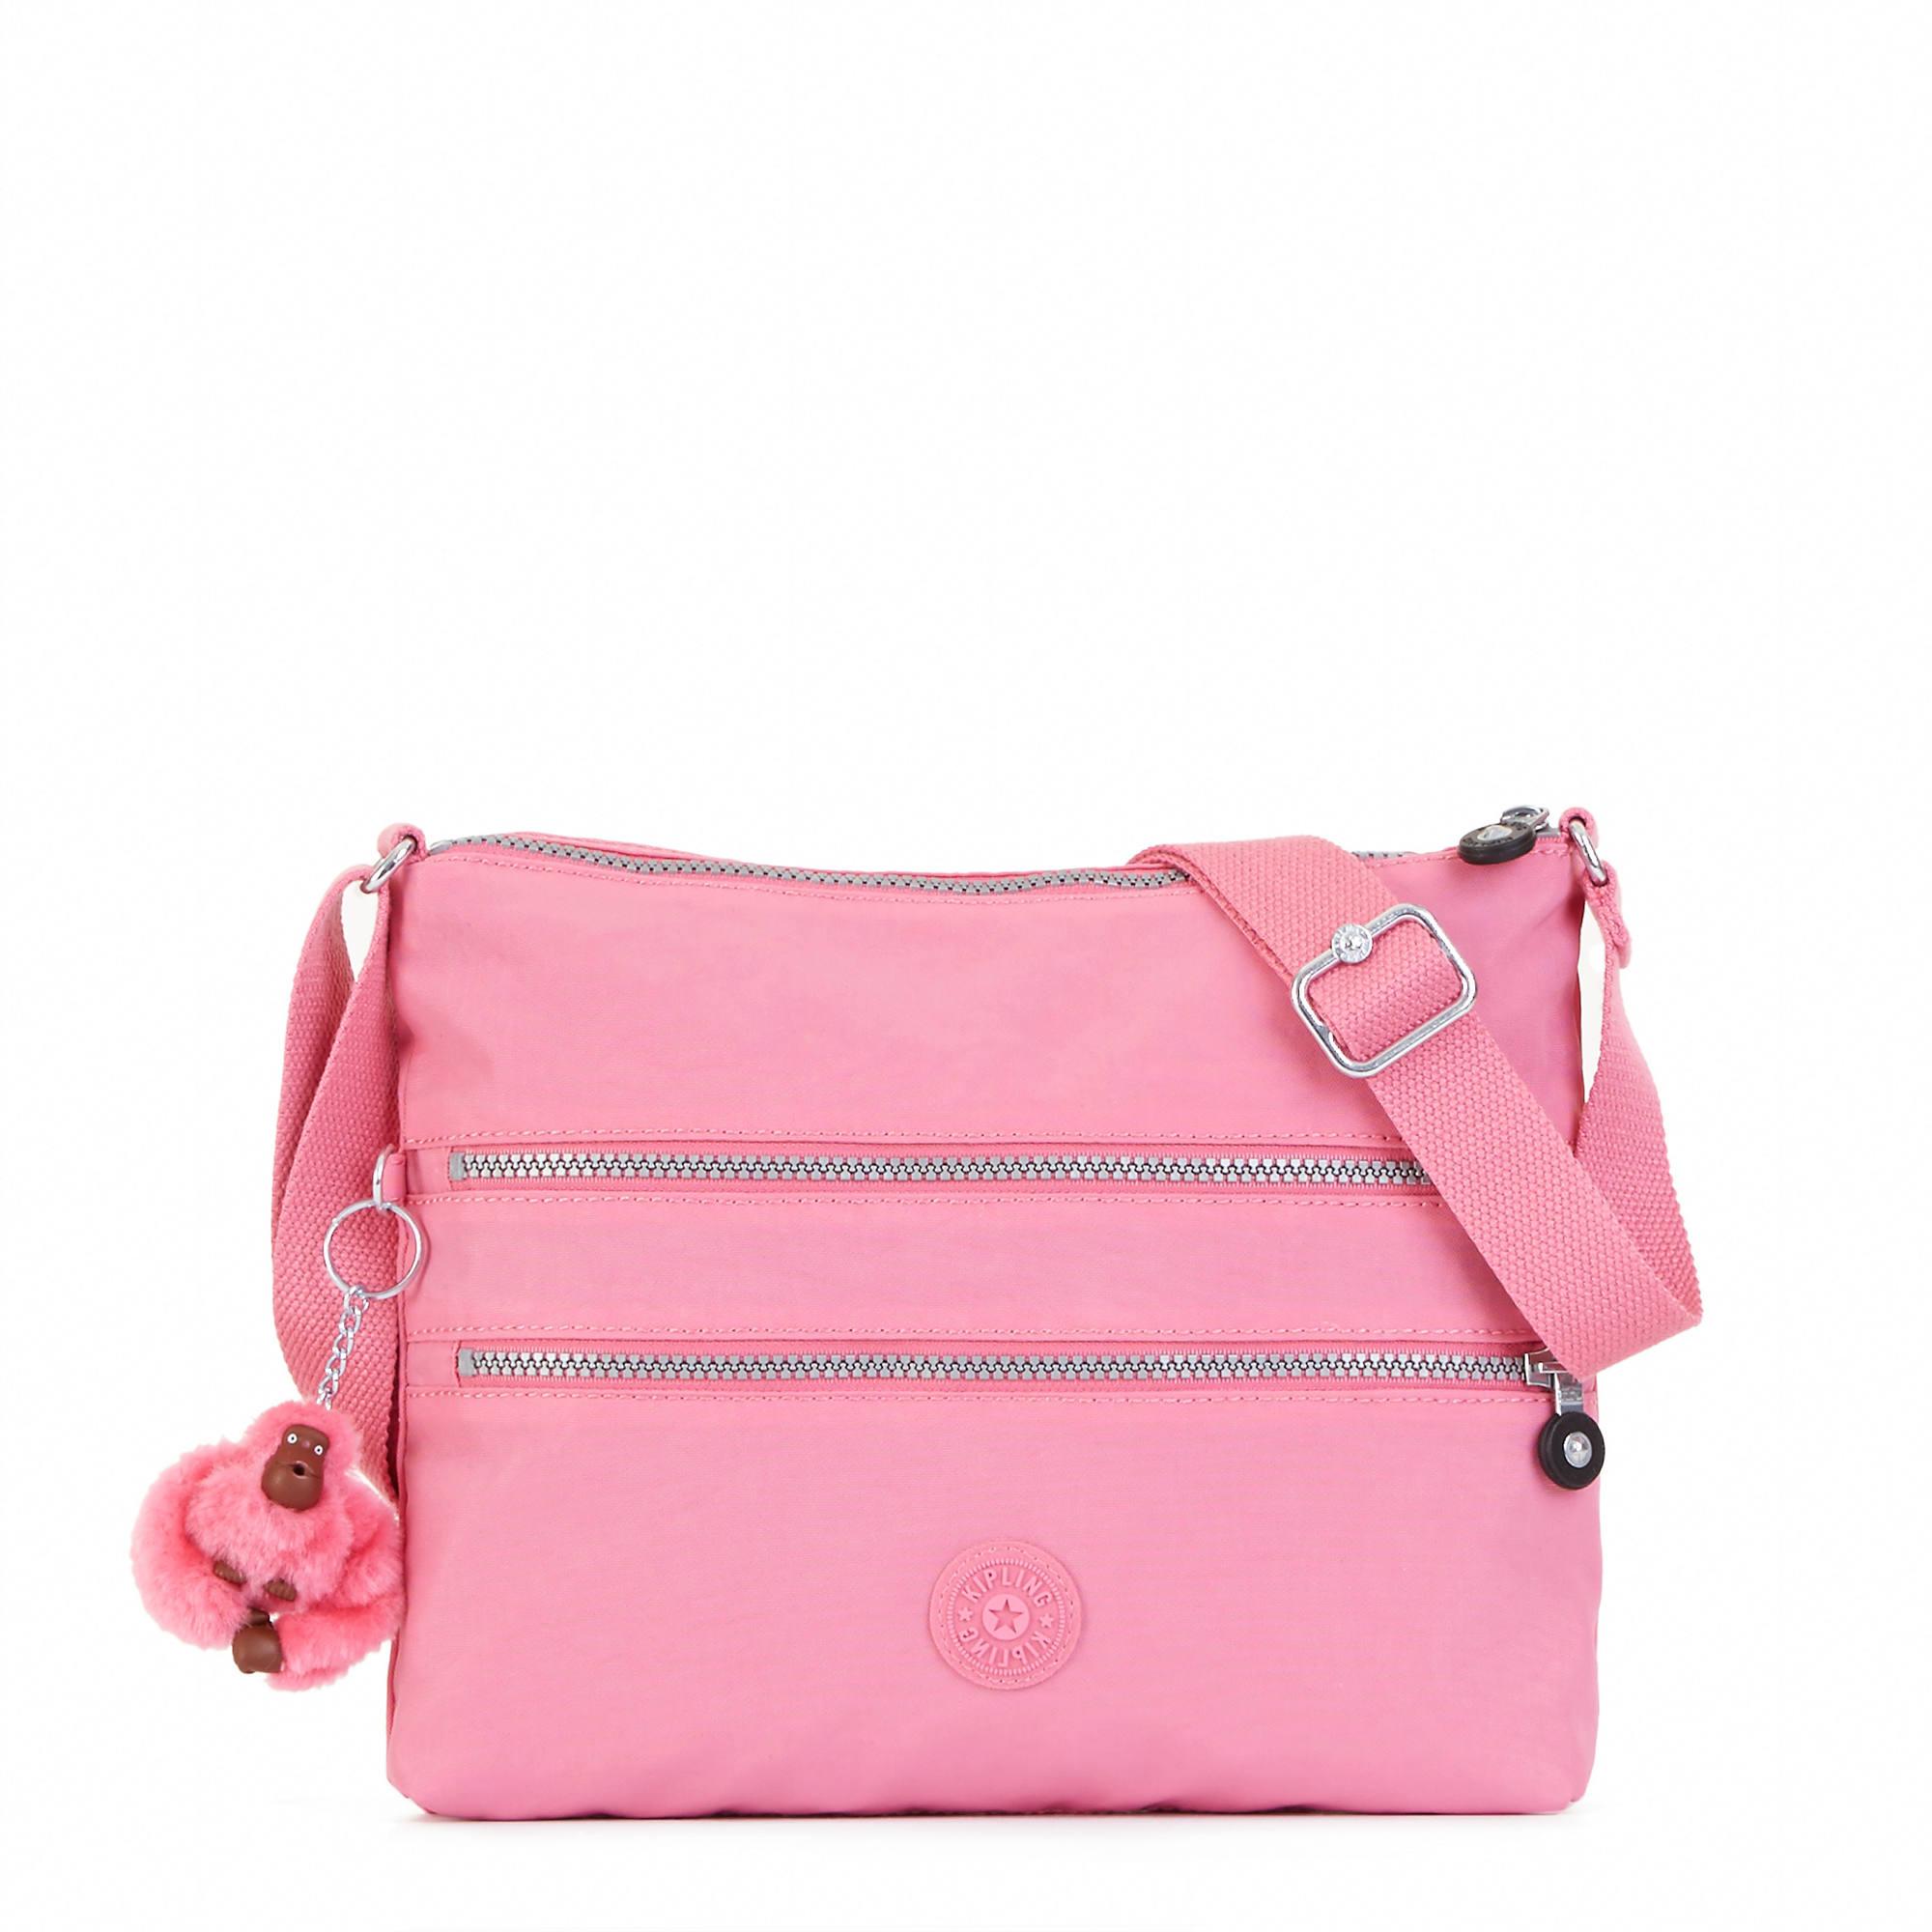 Kipling Hb4061 Alvar Crossbody Bag Pinkmacaron